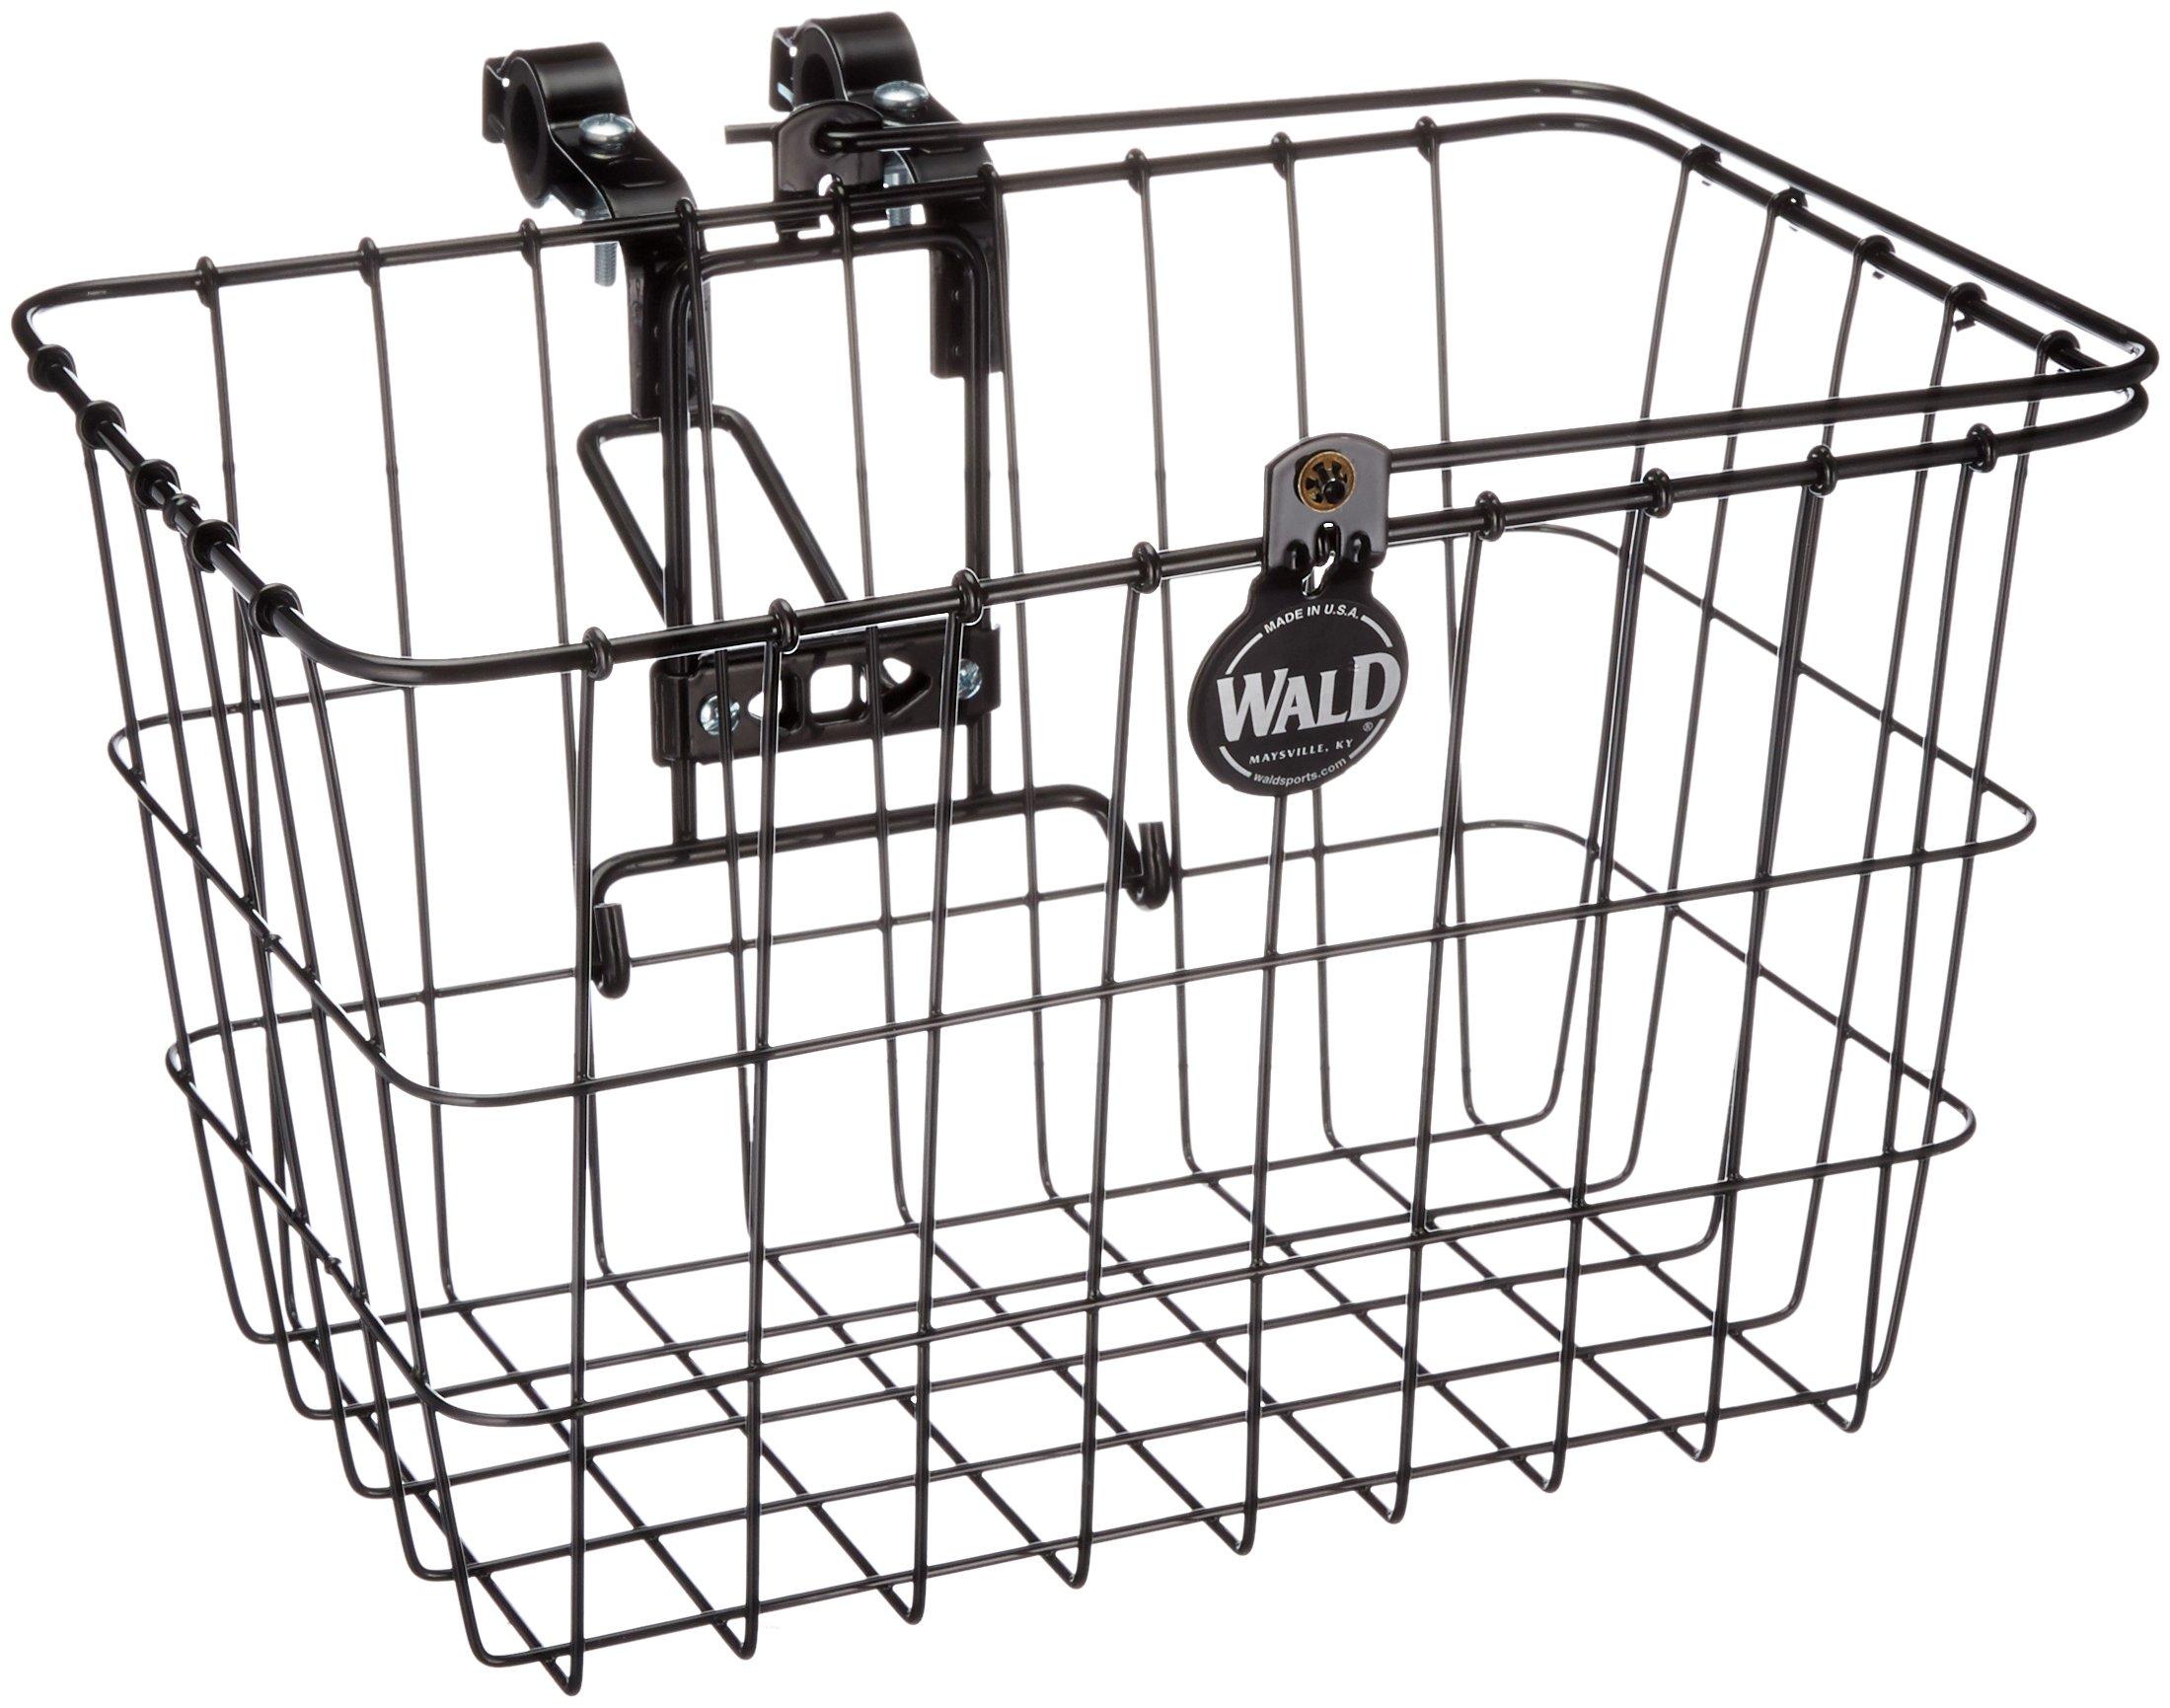 best rated in bike baskets helpful customer reviews amazon Food Symbol wald 3133 q r bolt on front handlebar bike basket product image